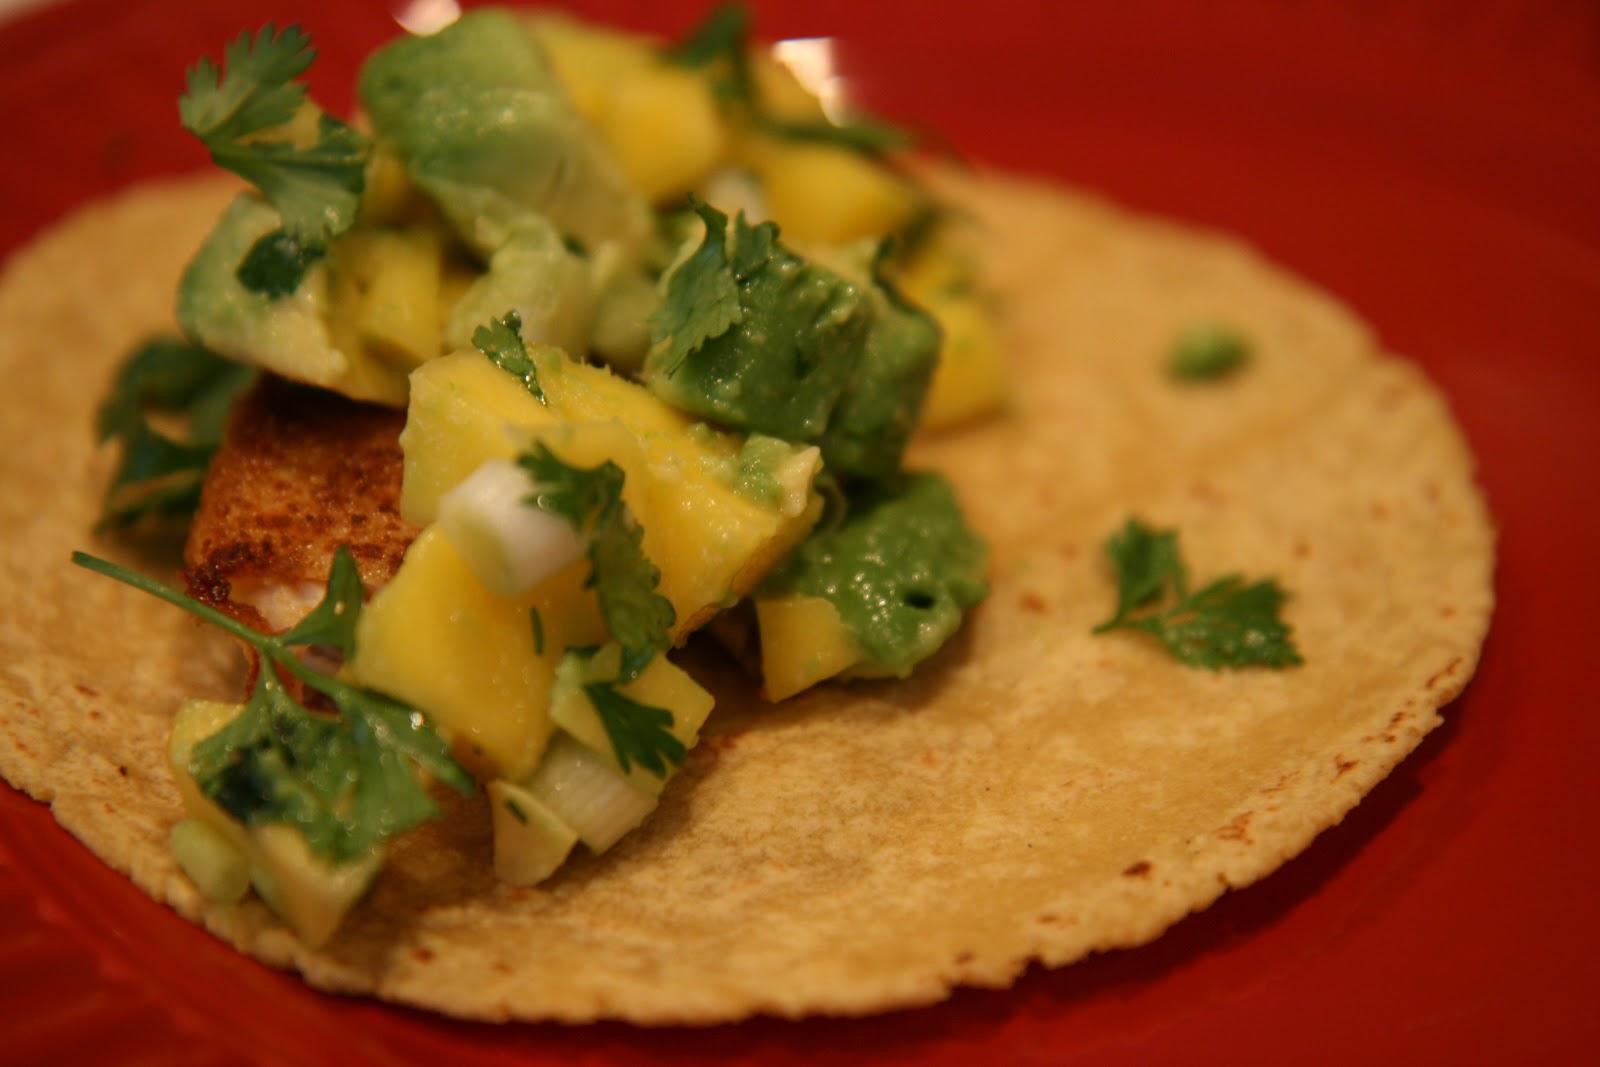 Oc mom blog tilapia fish tacos with mango and avocado salsa for Tilapia fish tacos